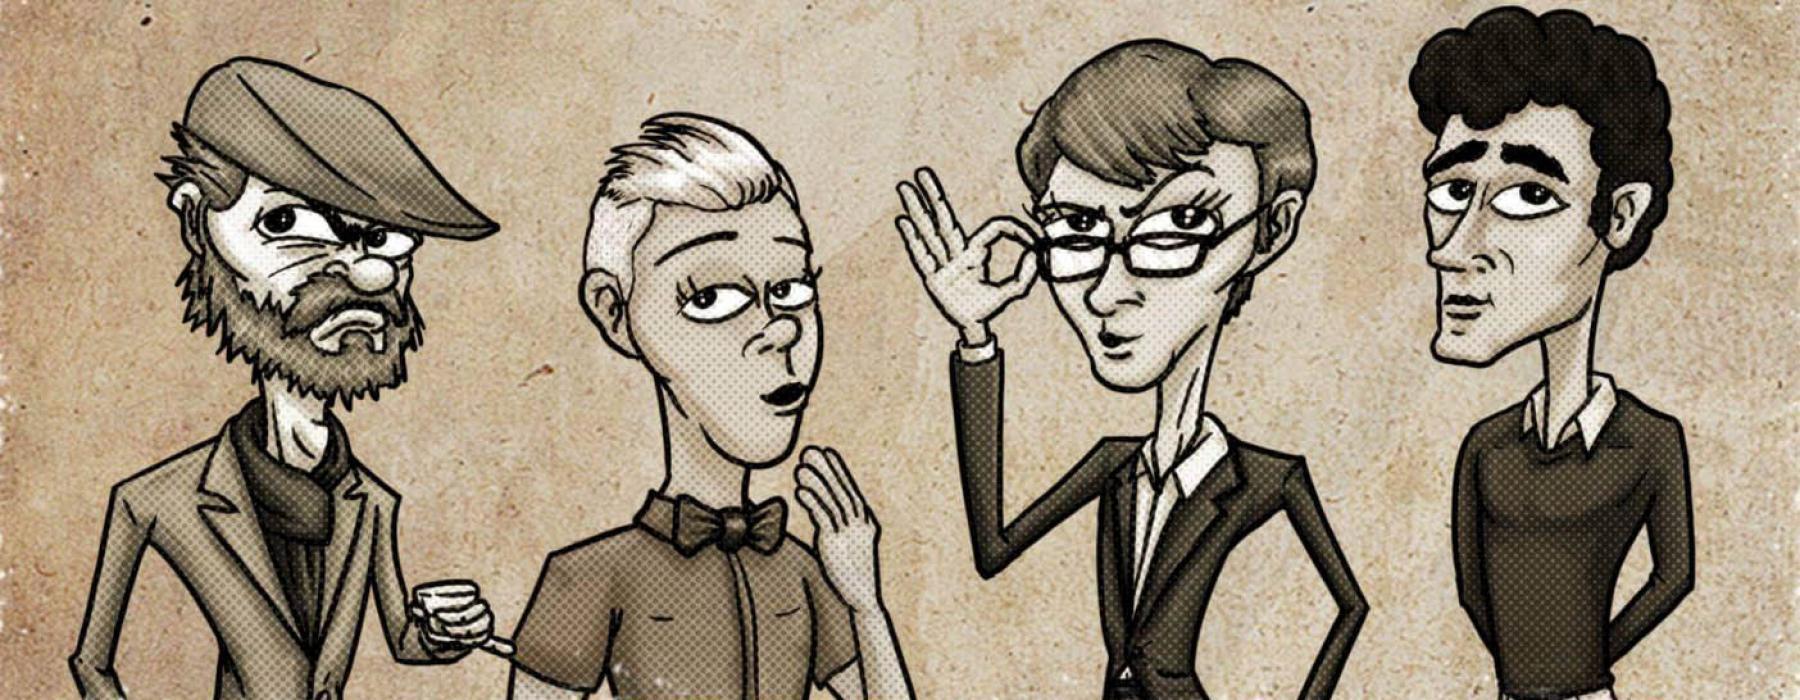 Illustration of the Wellington Pub Poets Society